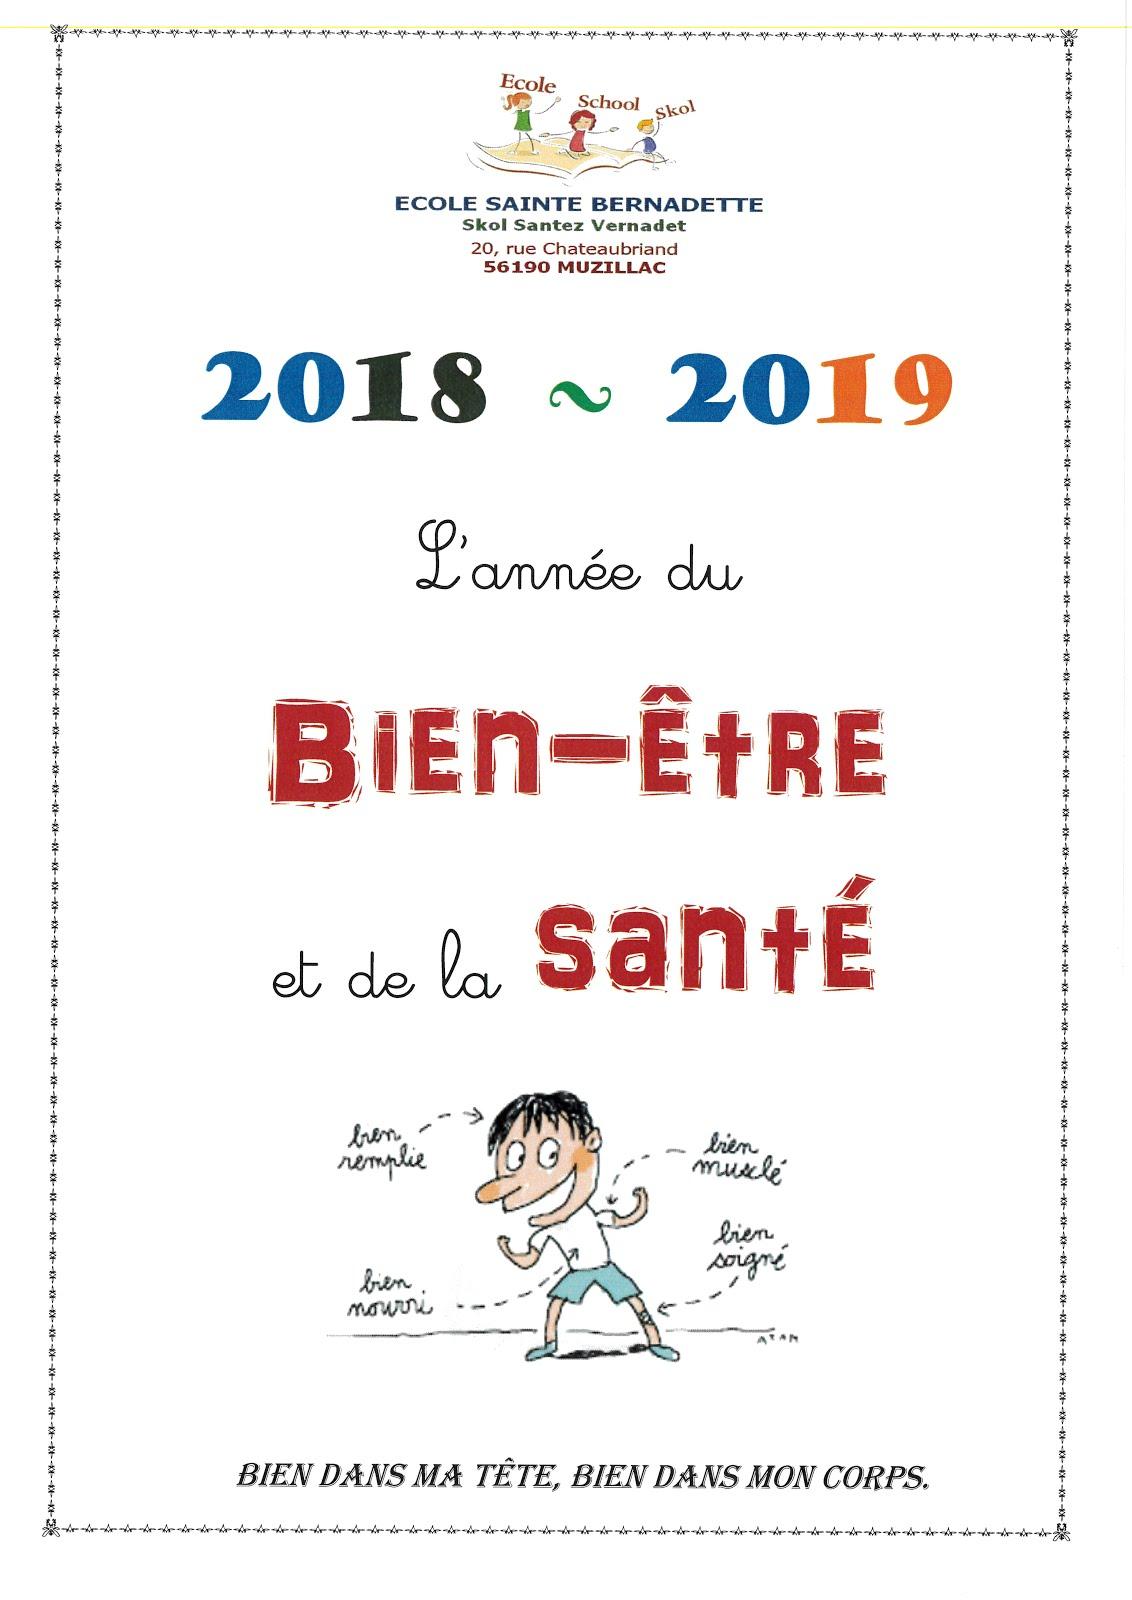 Thème 2018-2019